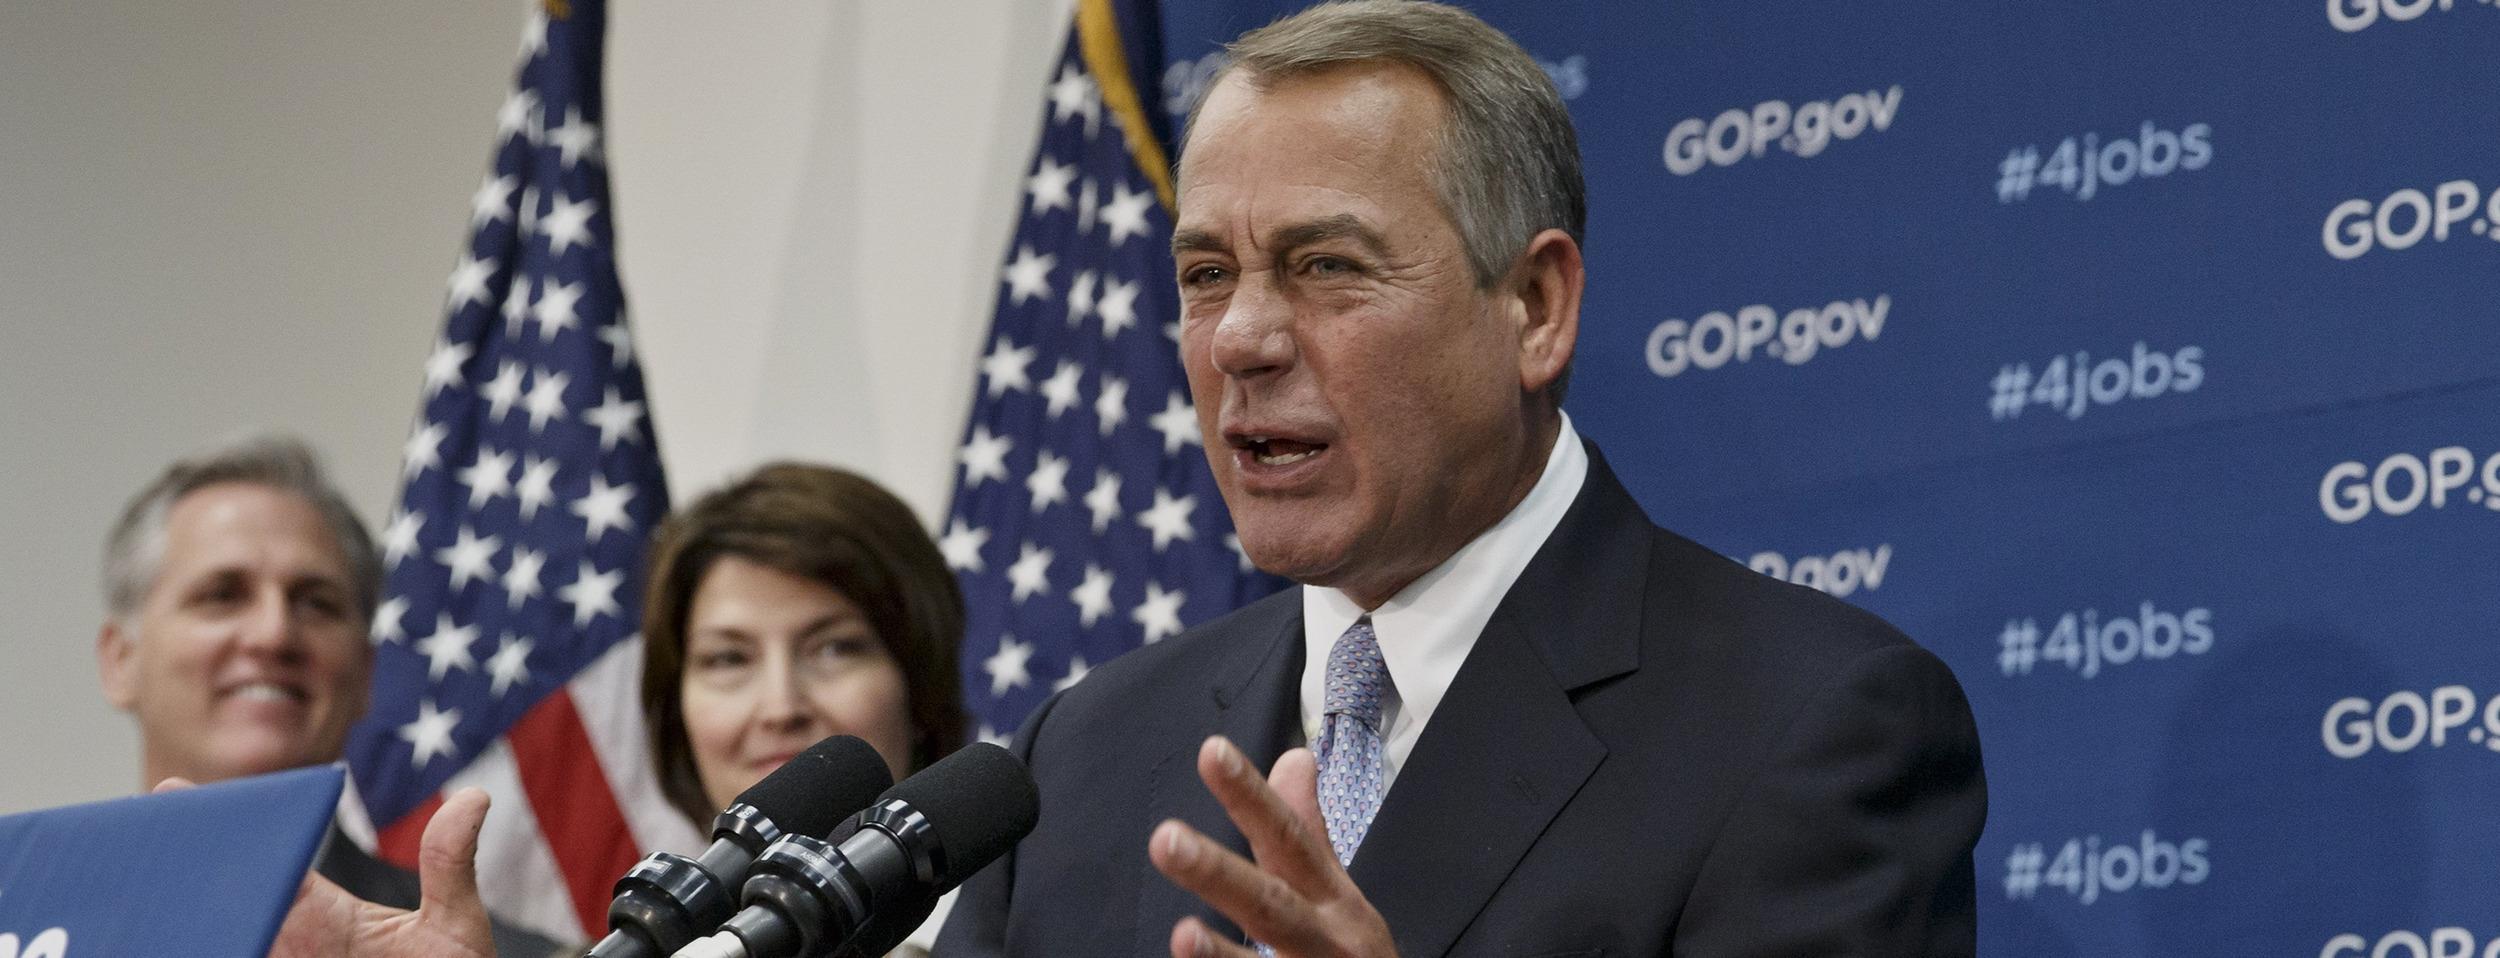 Image: John Boehner, Cathy McMorris Rodgers, Kevin McCarthy